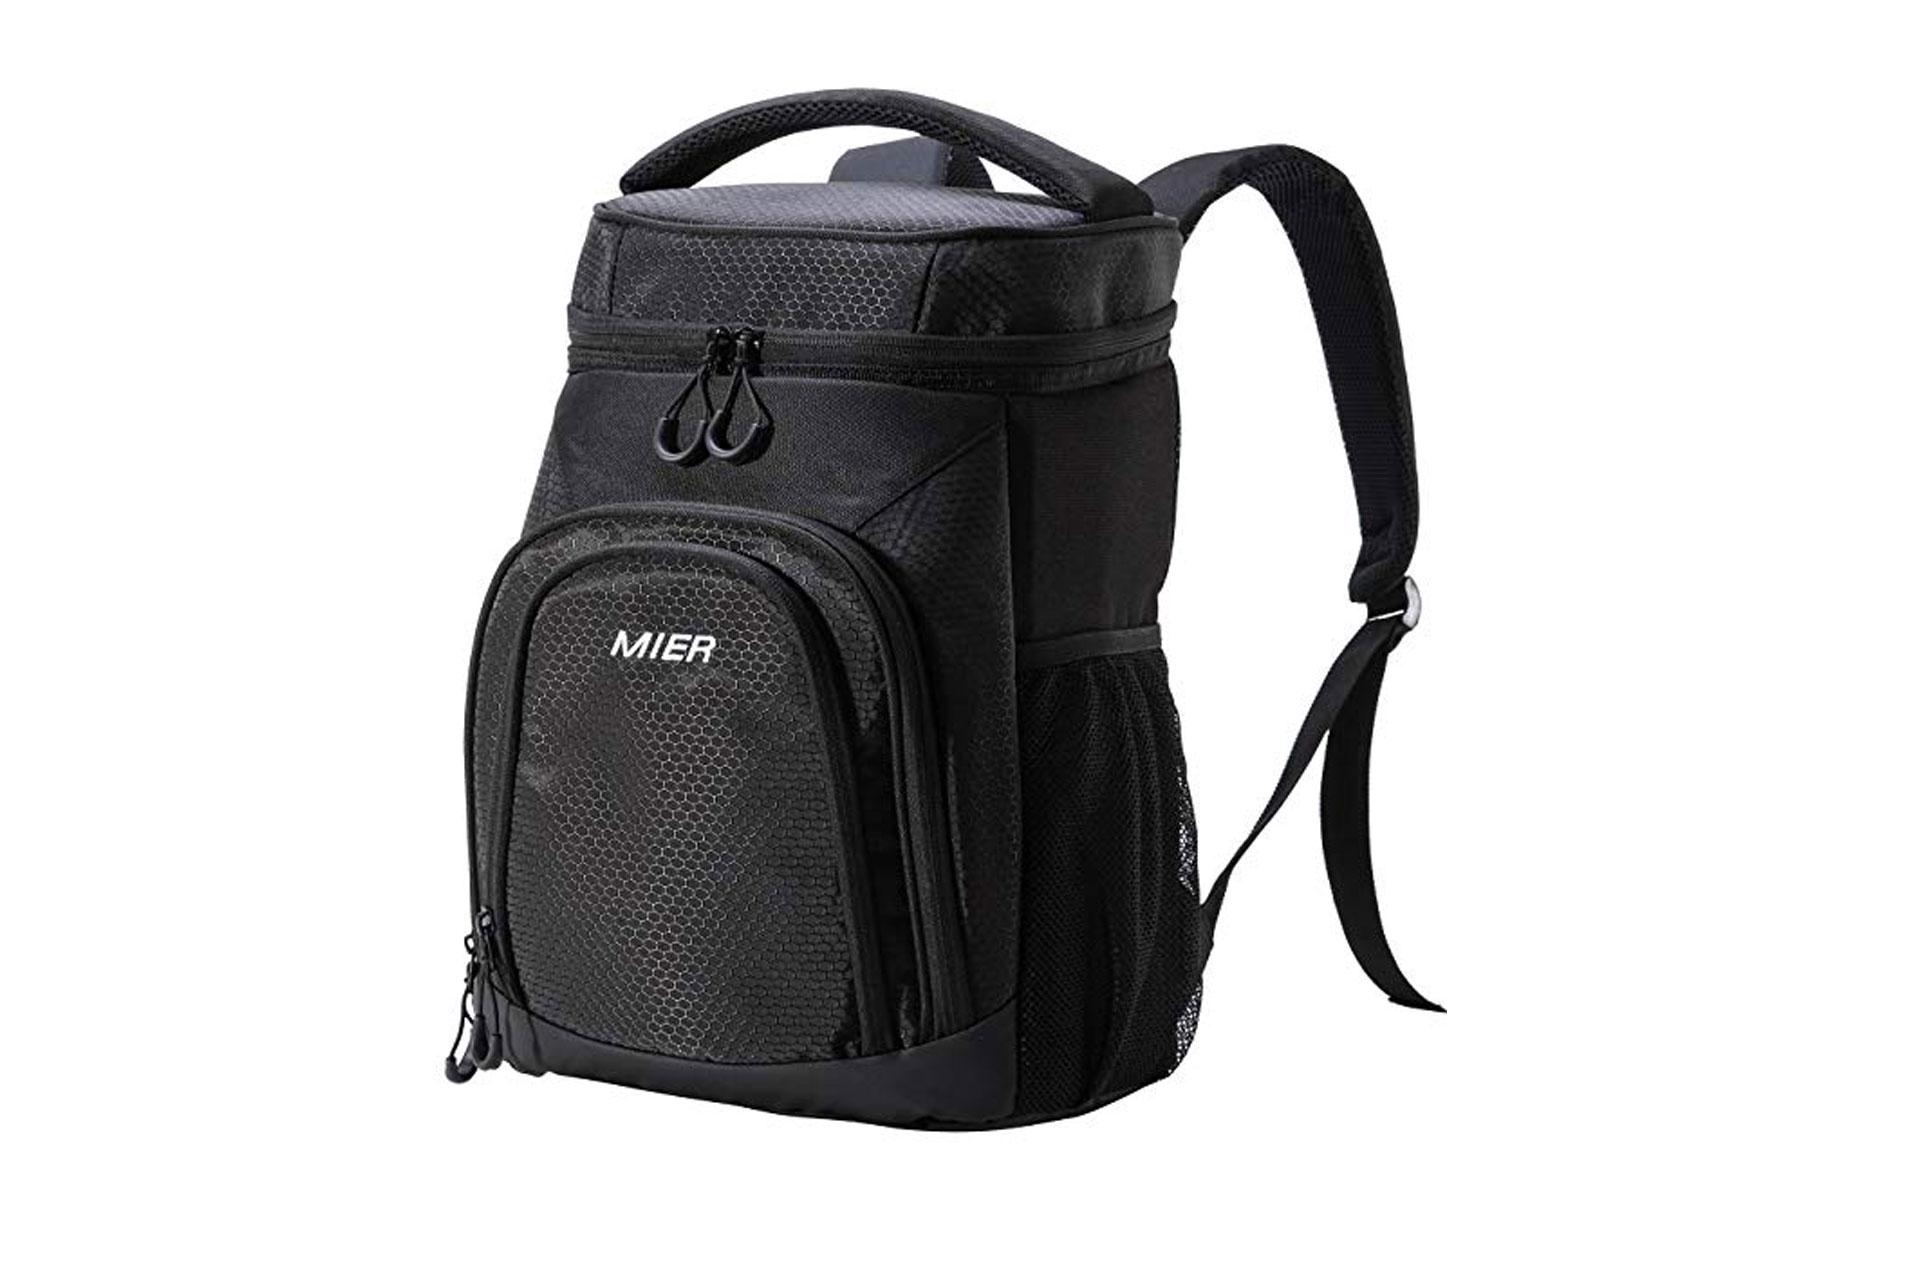 Cooler Bag; Courtesy of Amazon